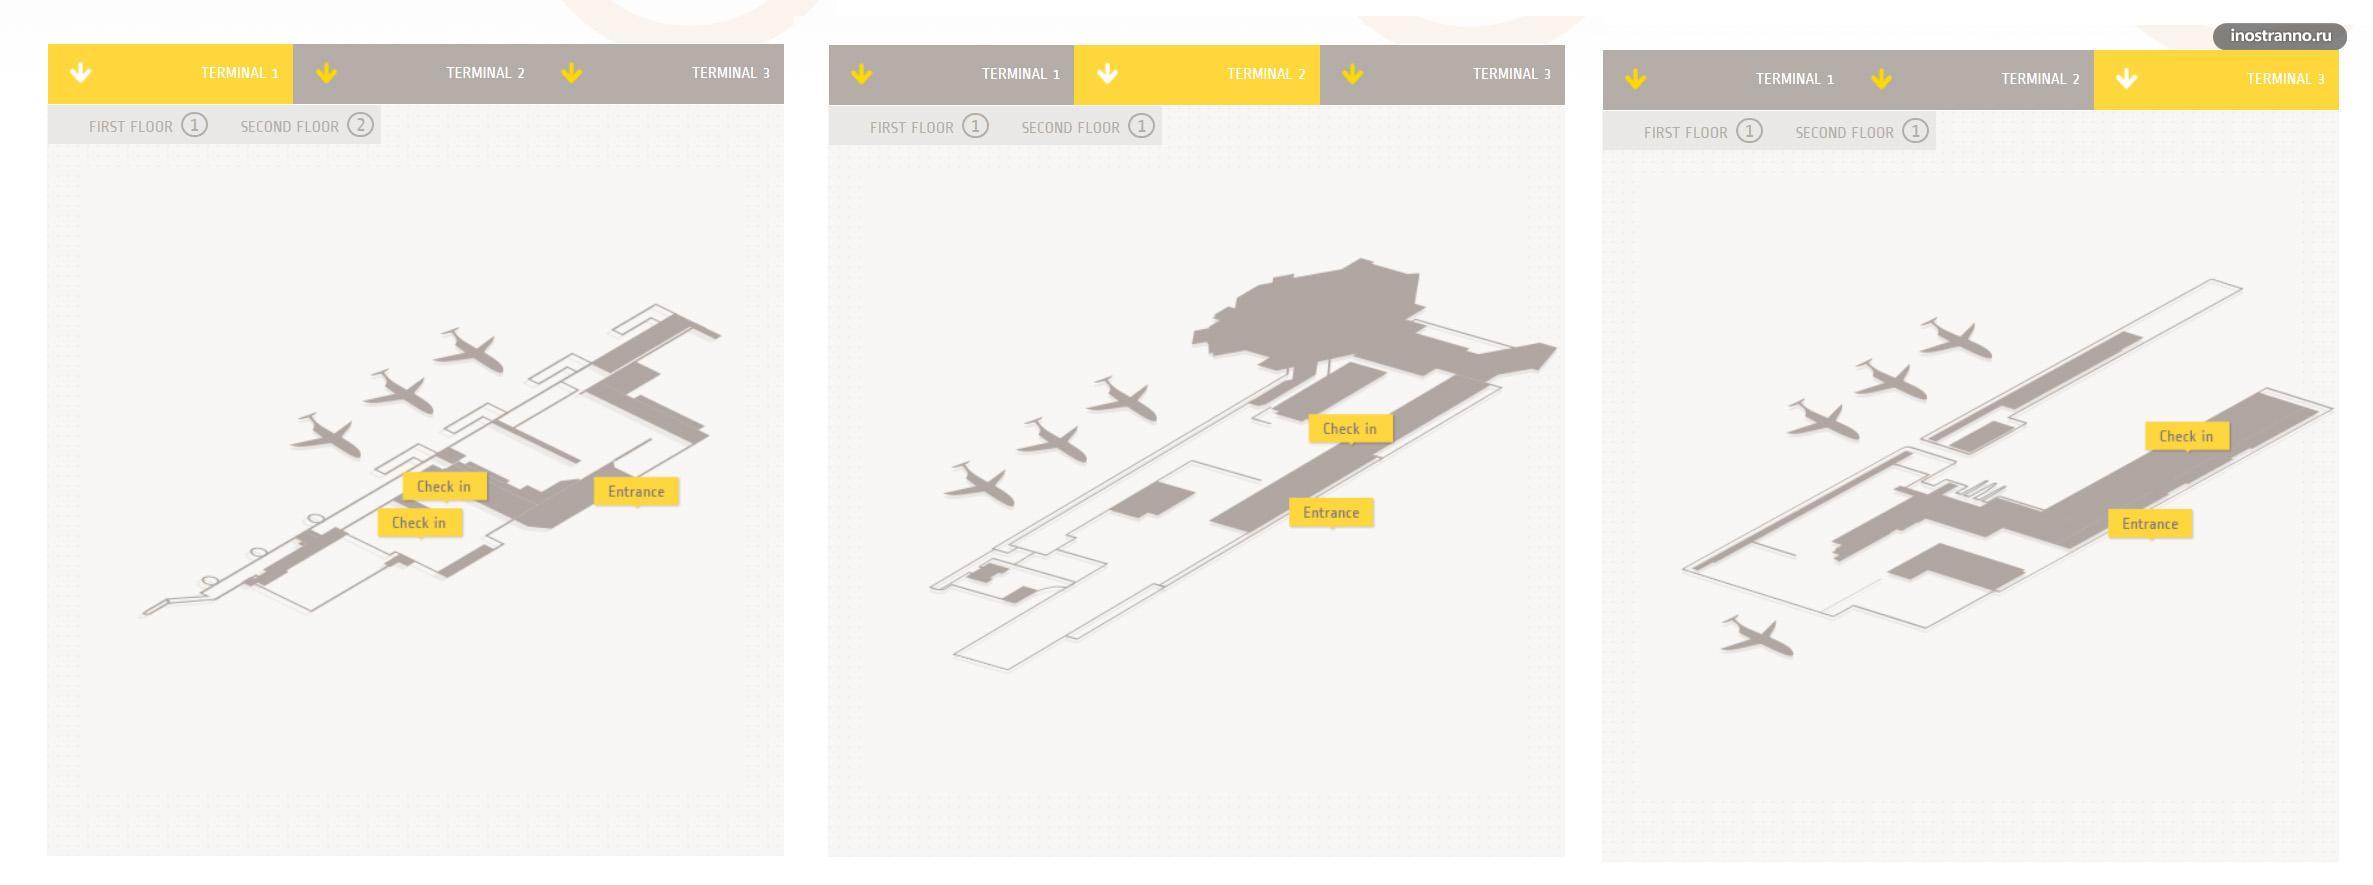 Аэропорт Канкун карта терминалов